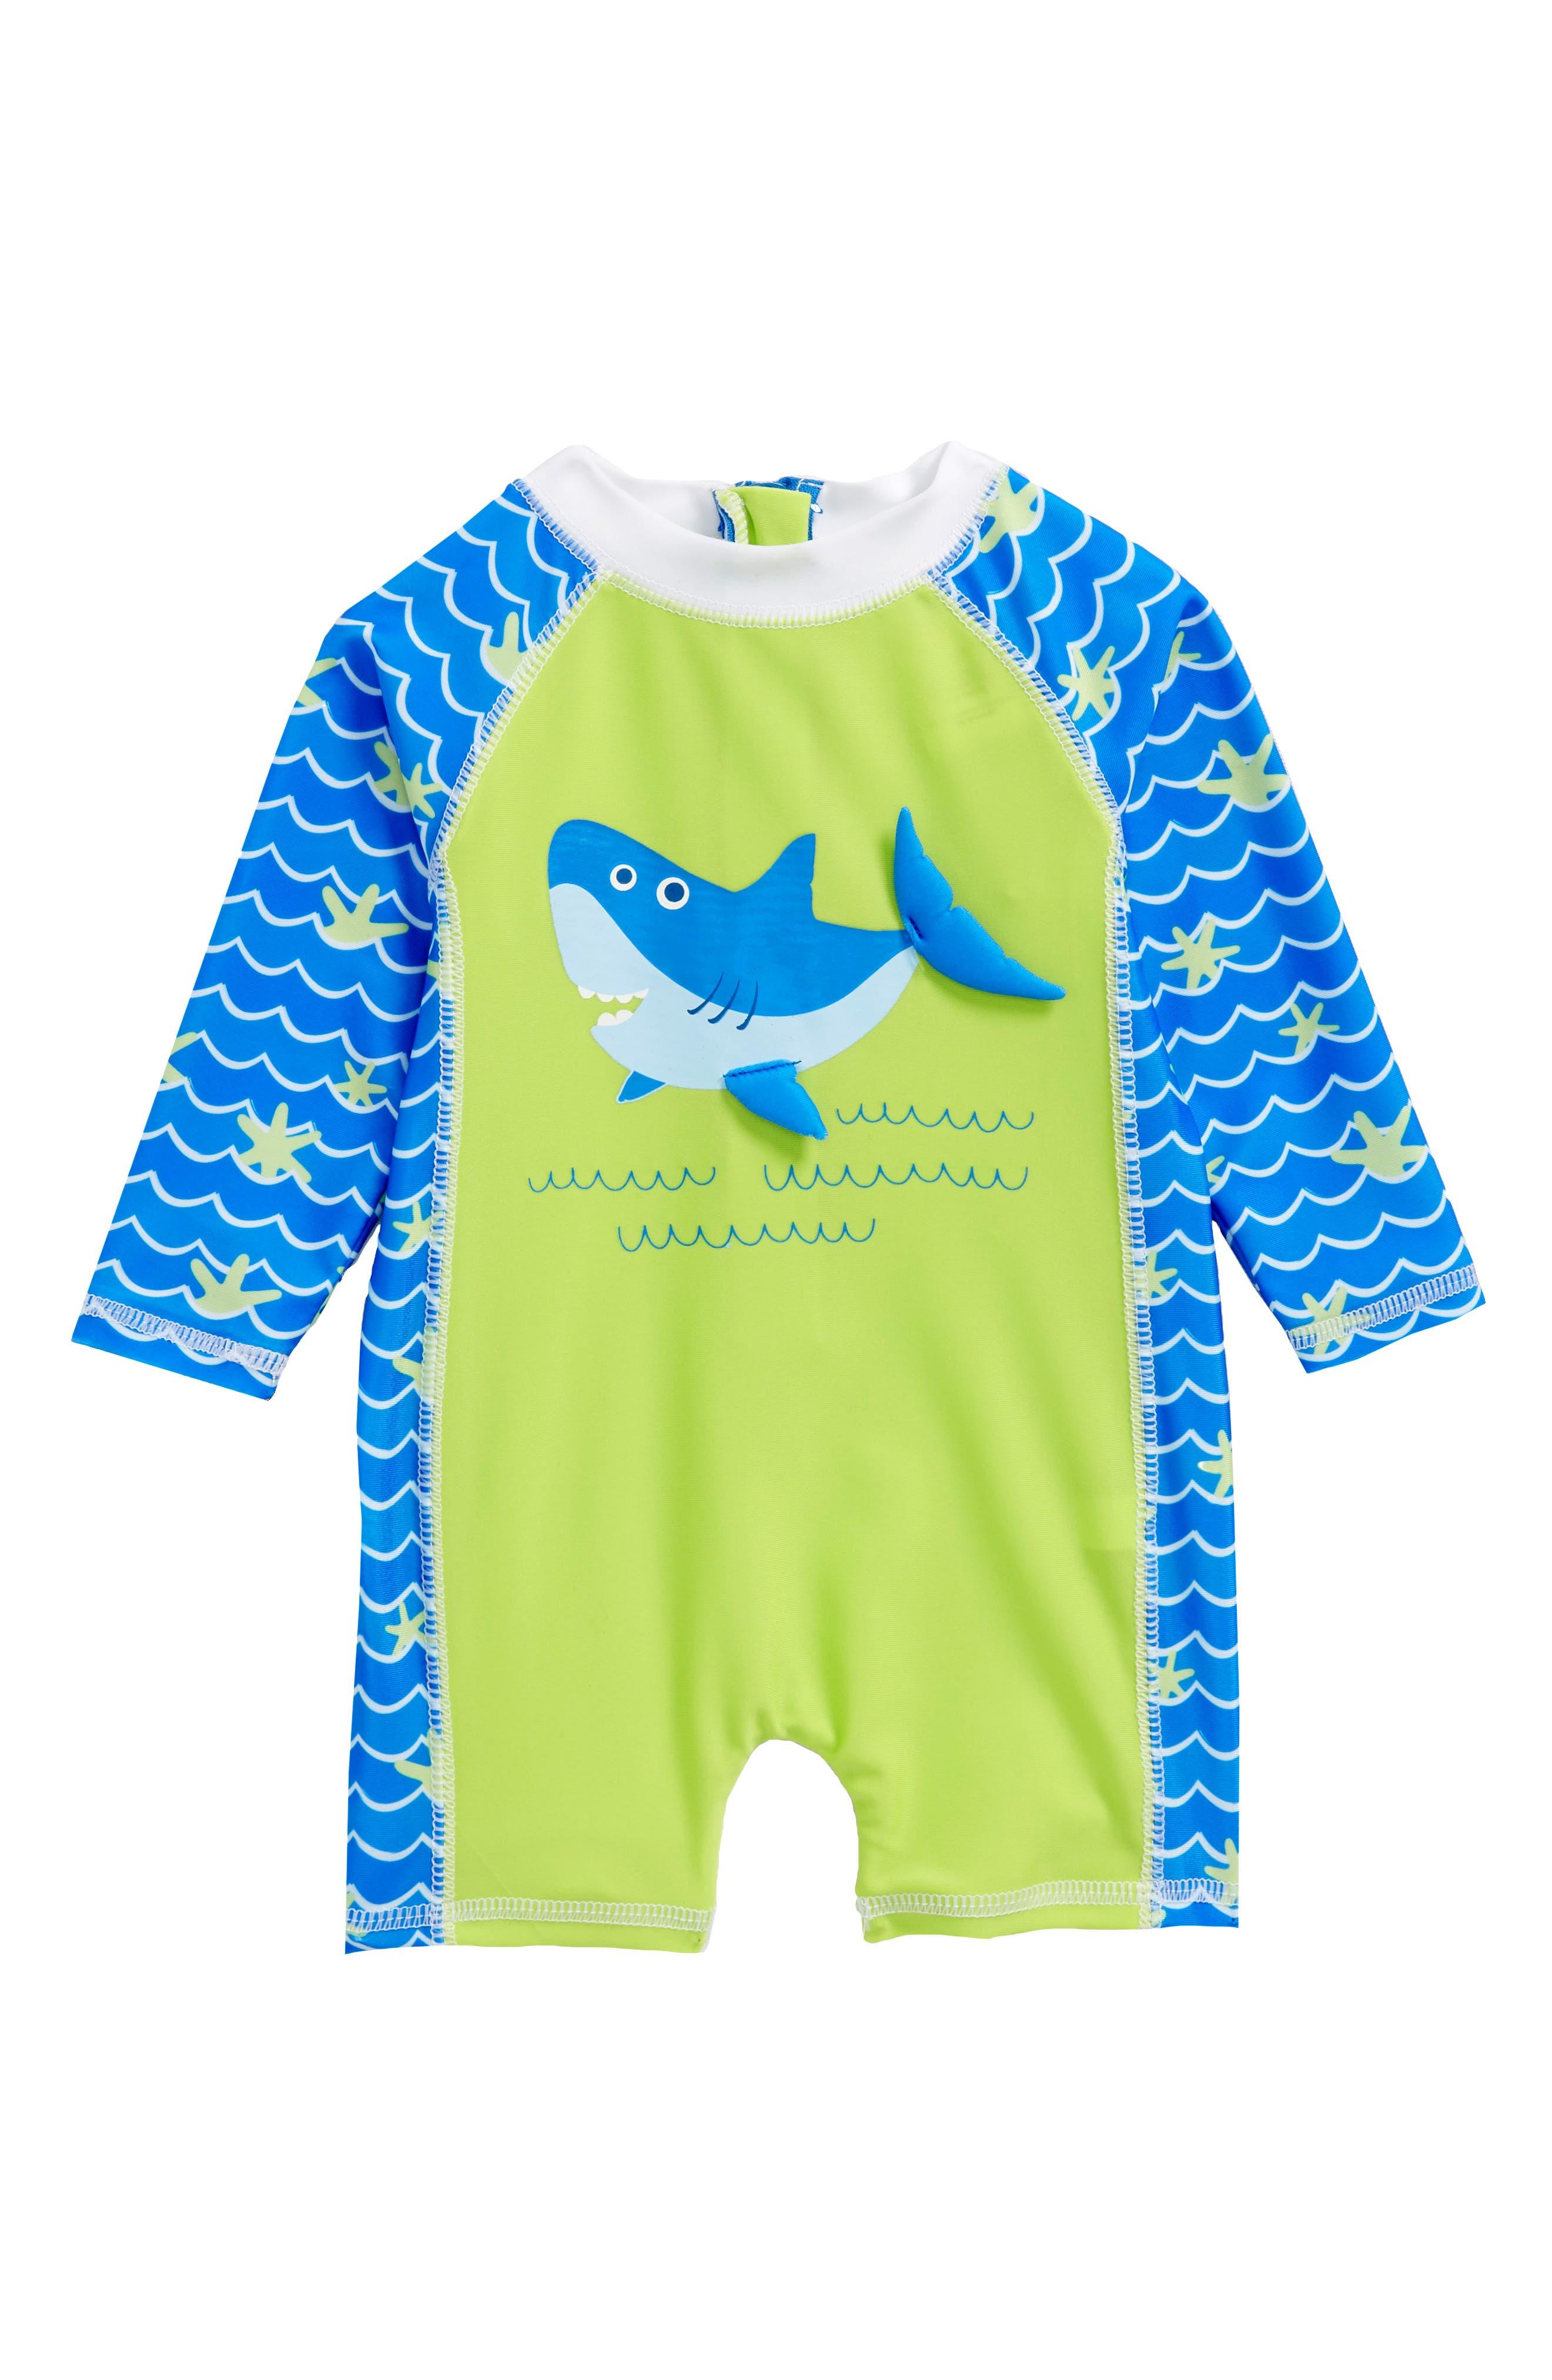 Shark Surf One-Piece Rashguard Swimsuit,                         Main,                         color, GREEN MULTI